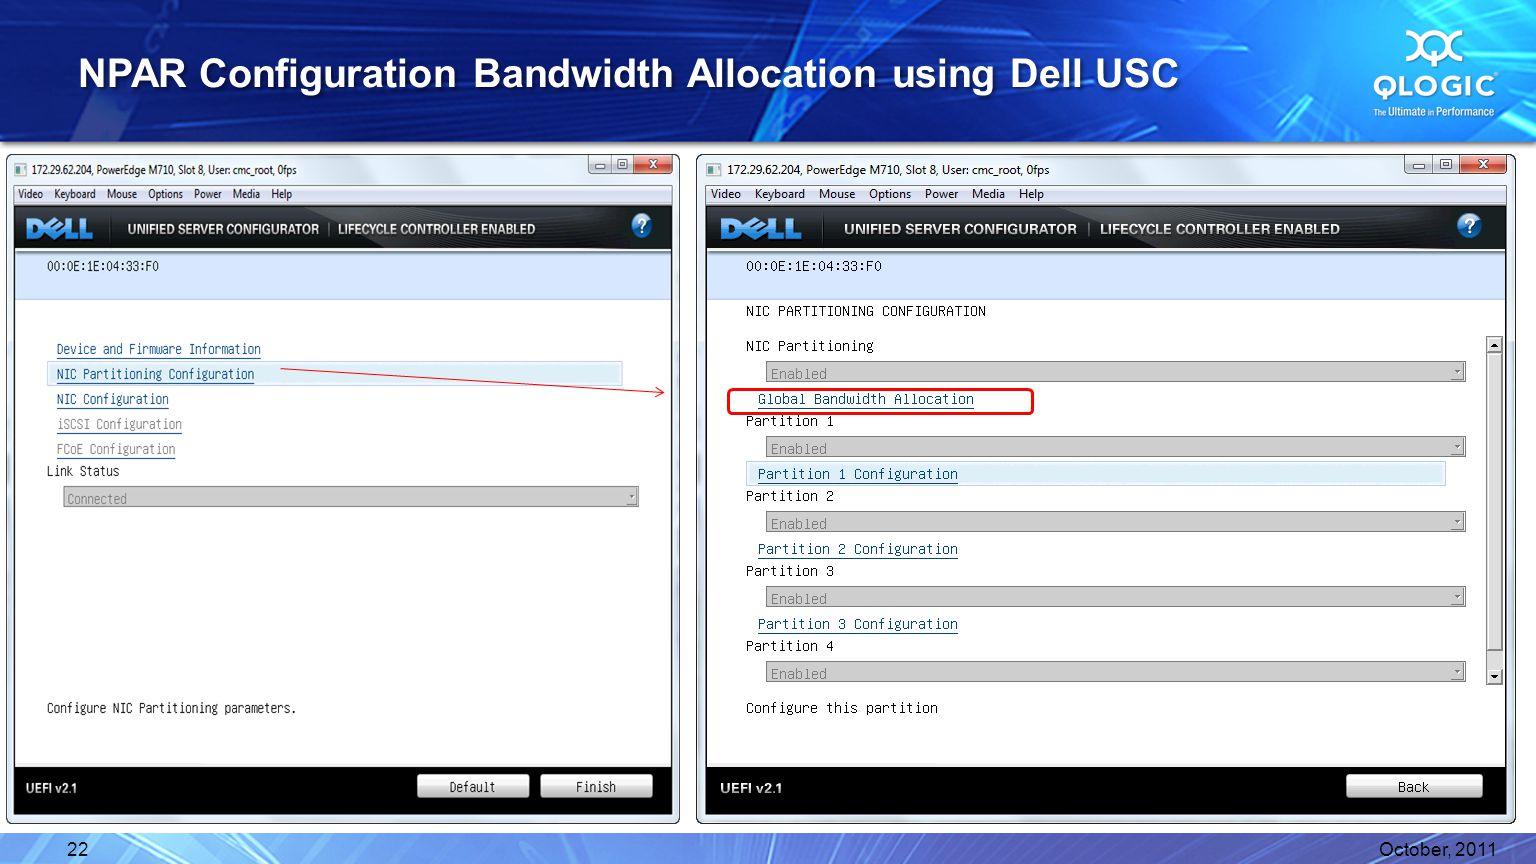 NPAR Configuration Bandwidth Allocation using Dell USC